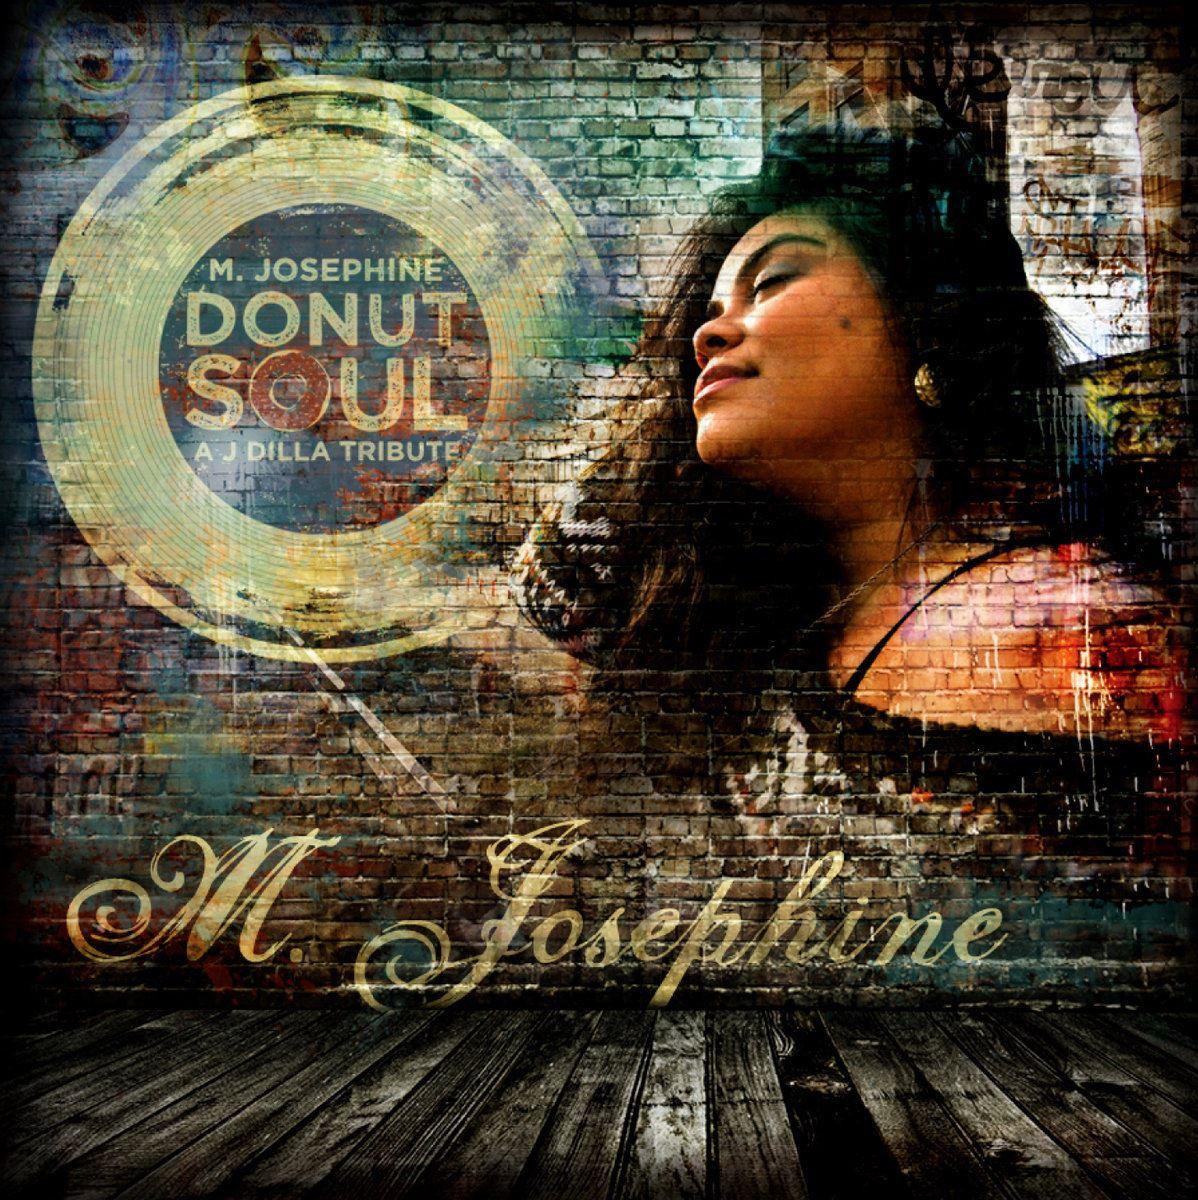 M. Josephine Donut Soul